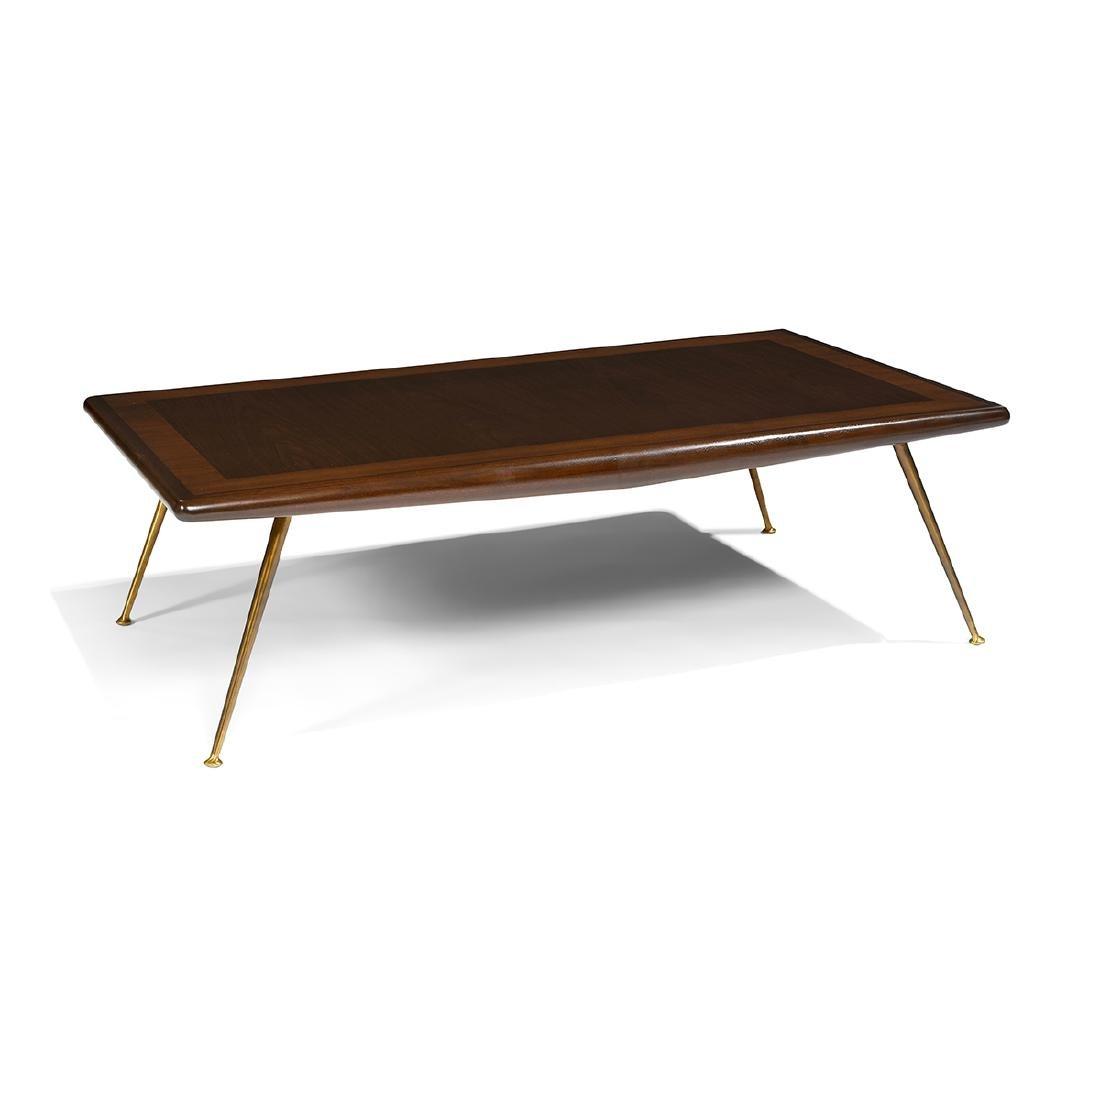 T.H. Robsjohn-Gibbings / Widdicomb coffee table